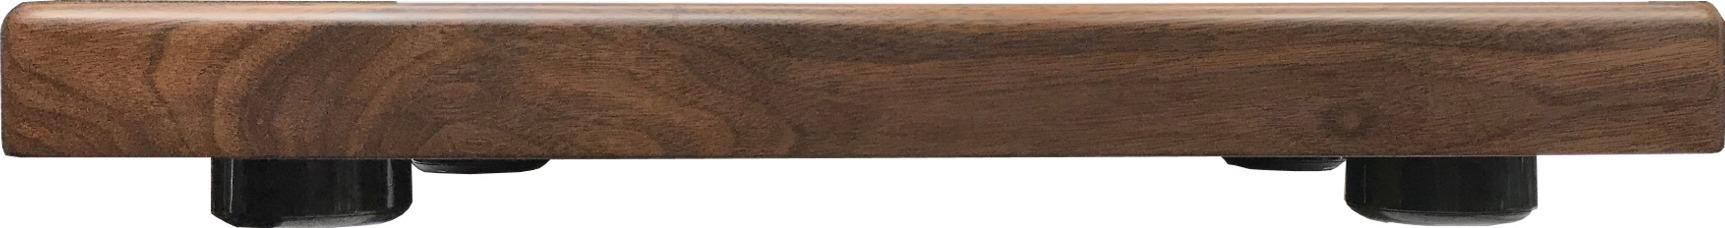 AIRBOW - WOODBASE(47cm×52cm・1枚)《JP》【納期かかります・受注後一ヶ月程度】